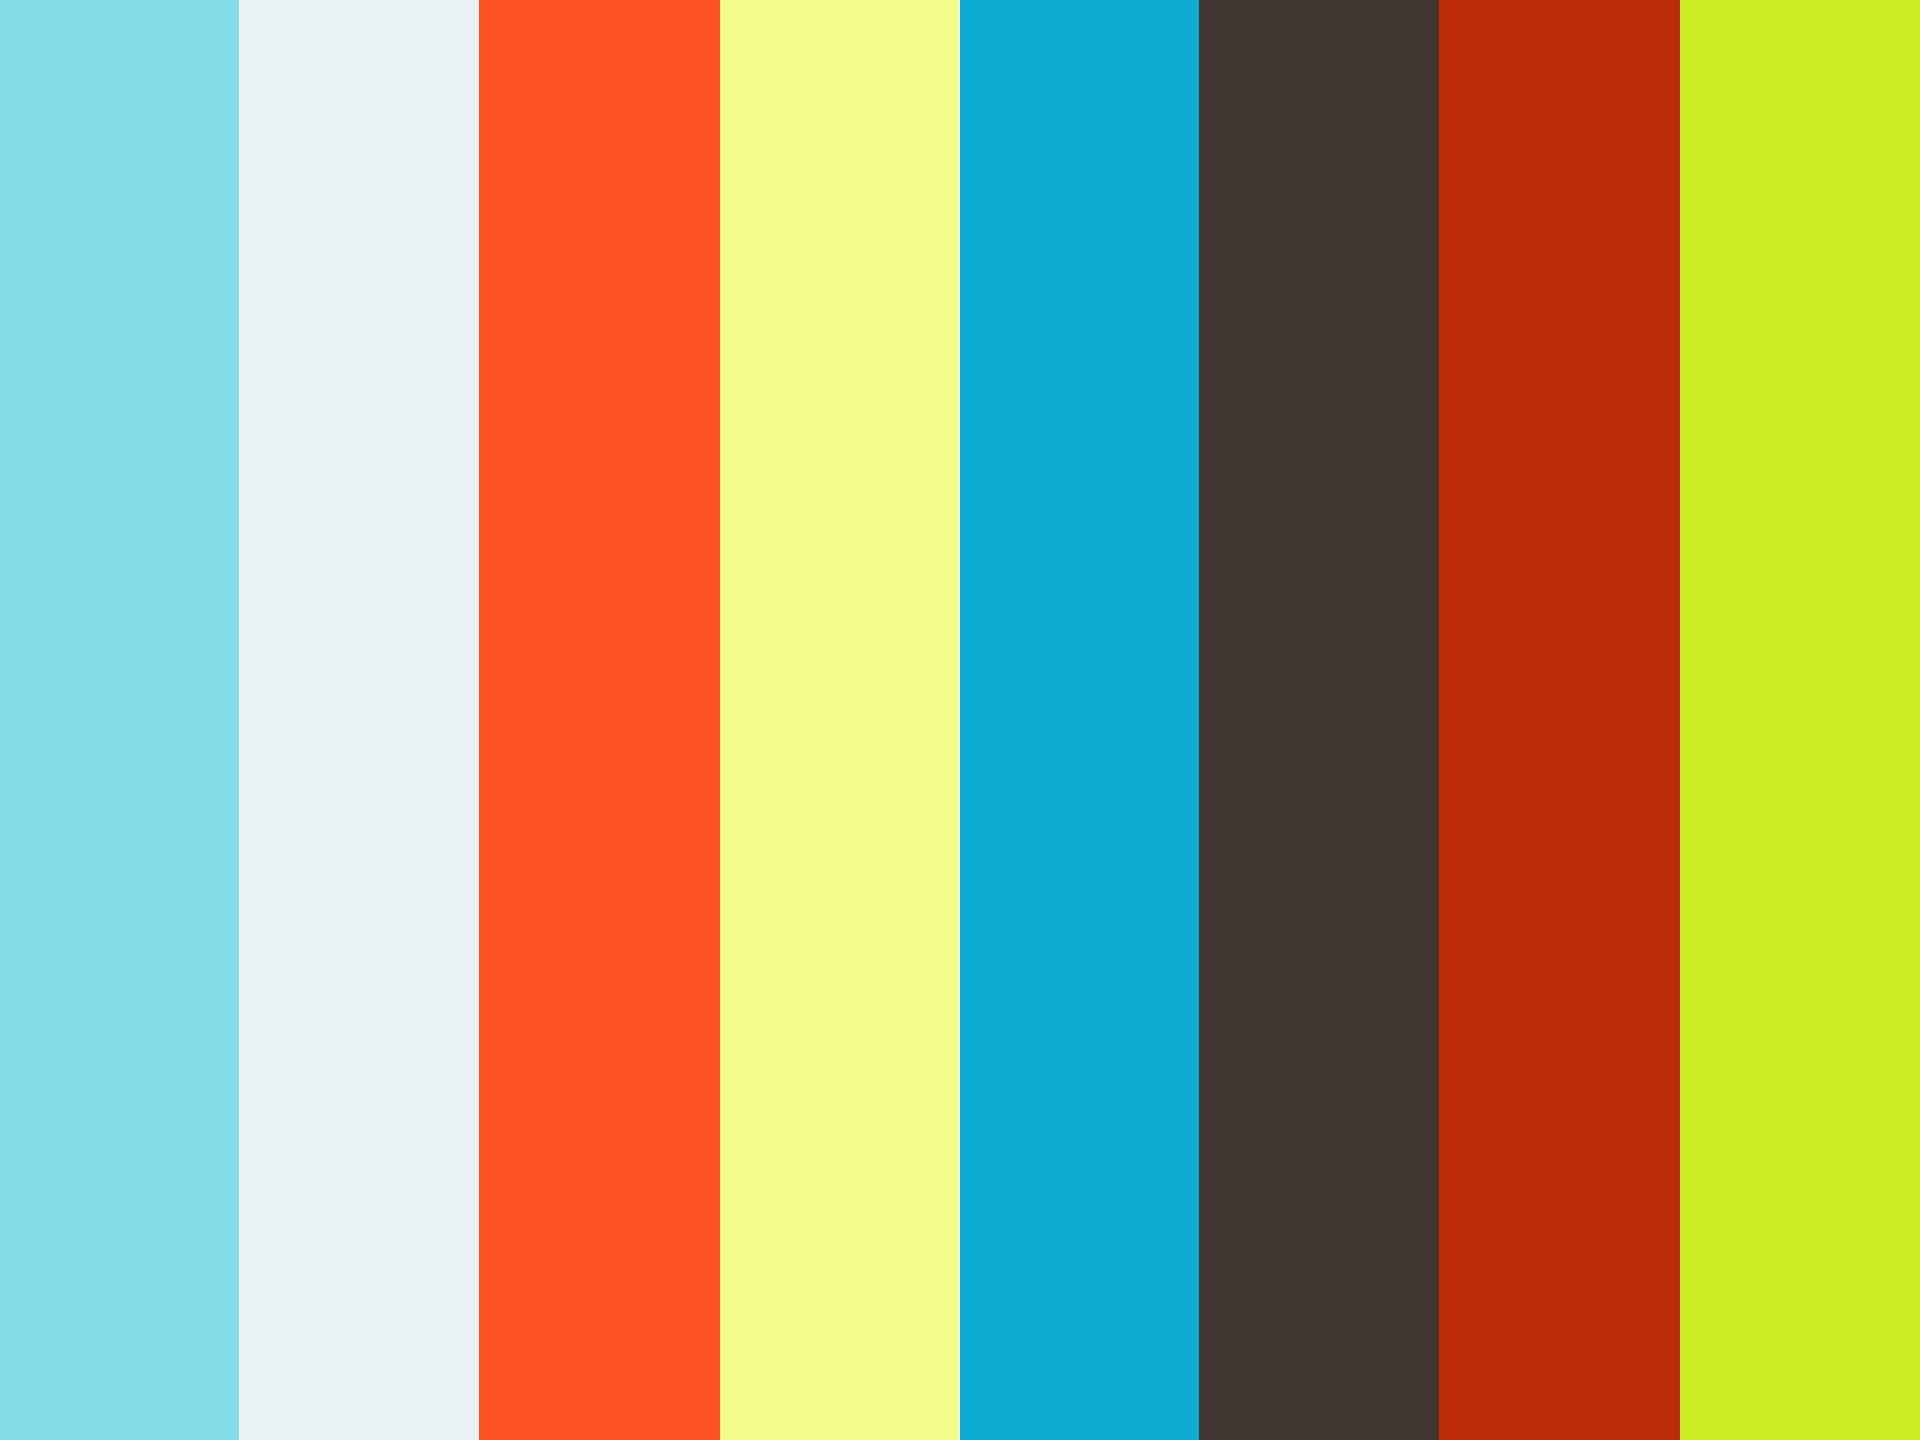 【Book Rev.】攻めのクラウン・ブリッジ #3 補綴装置の形態